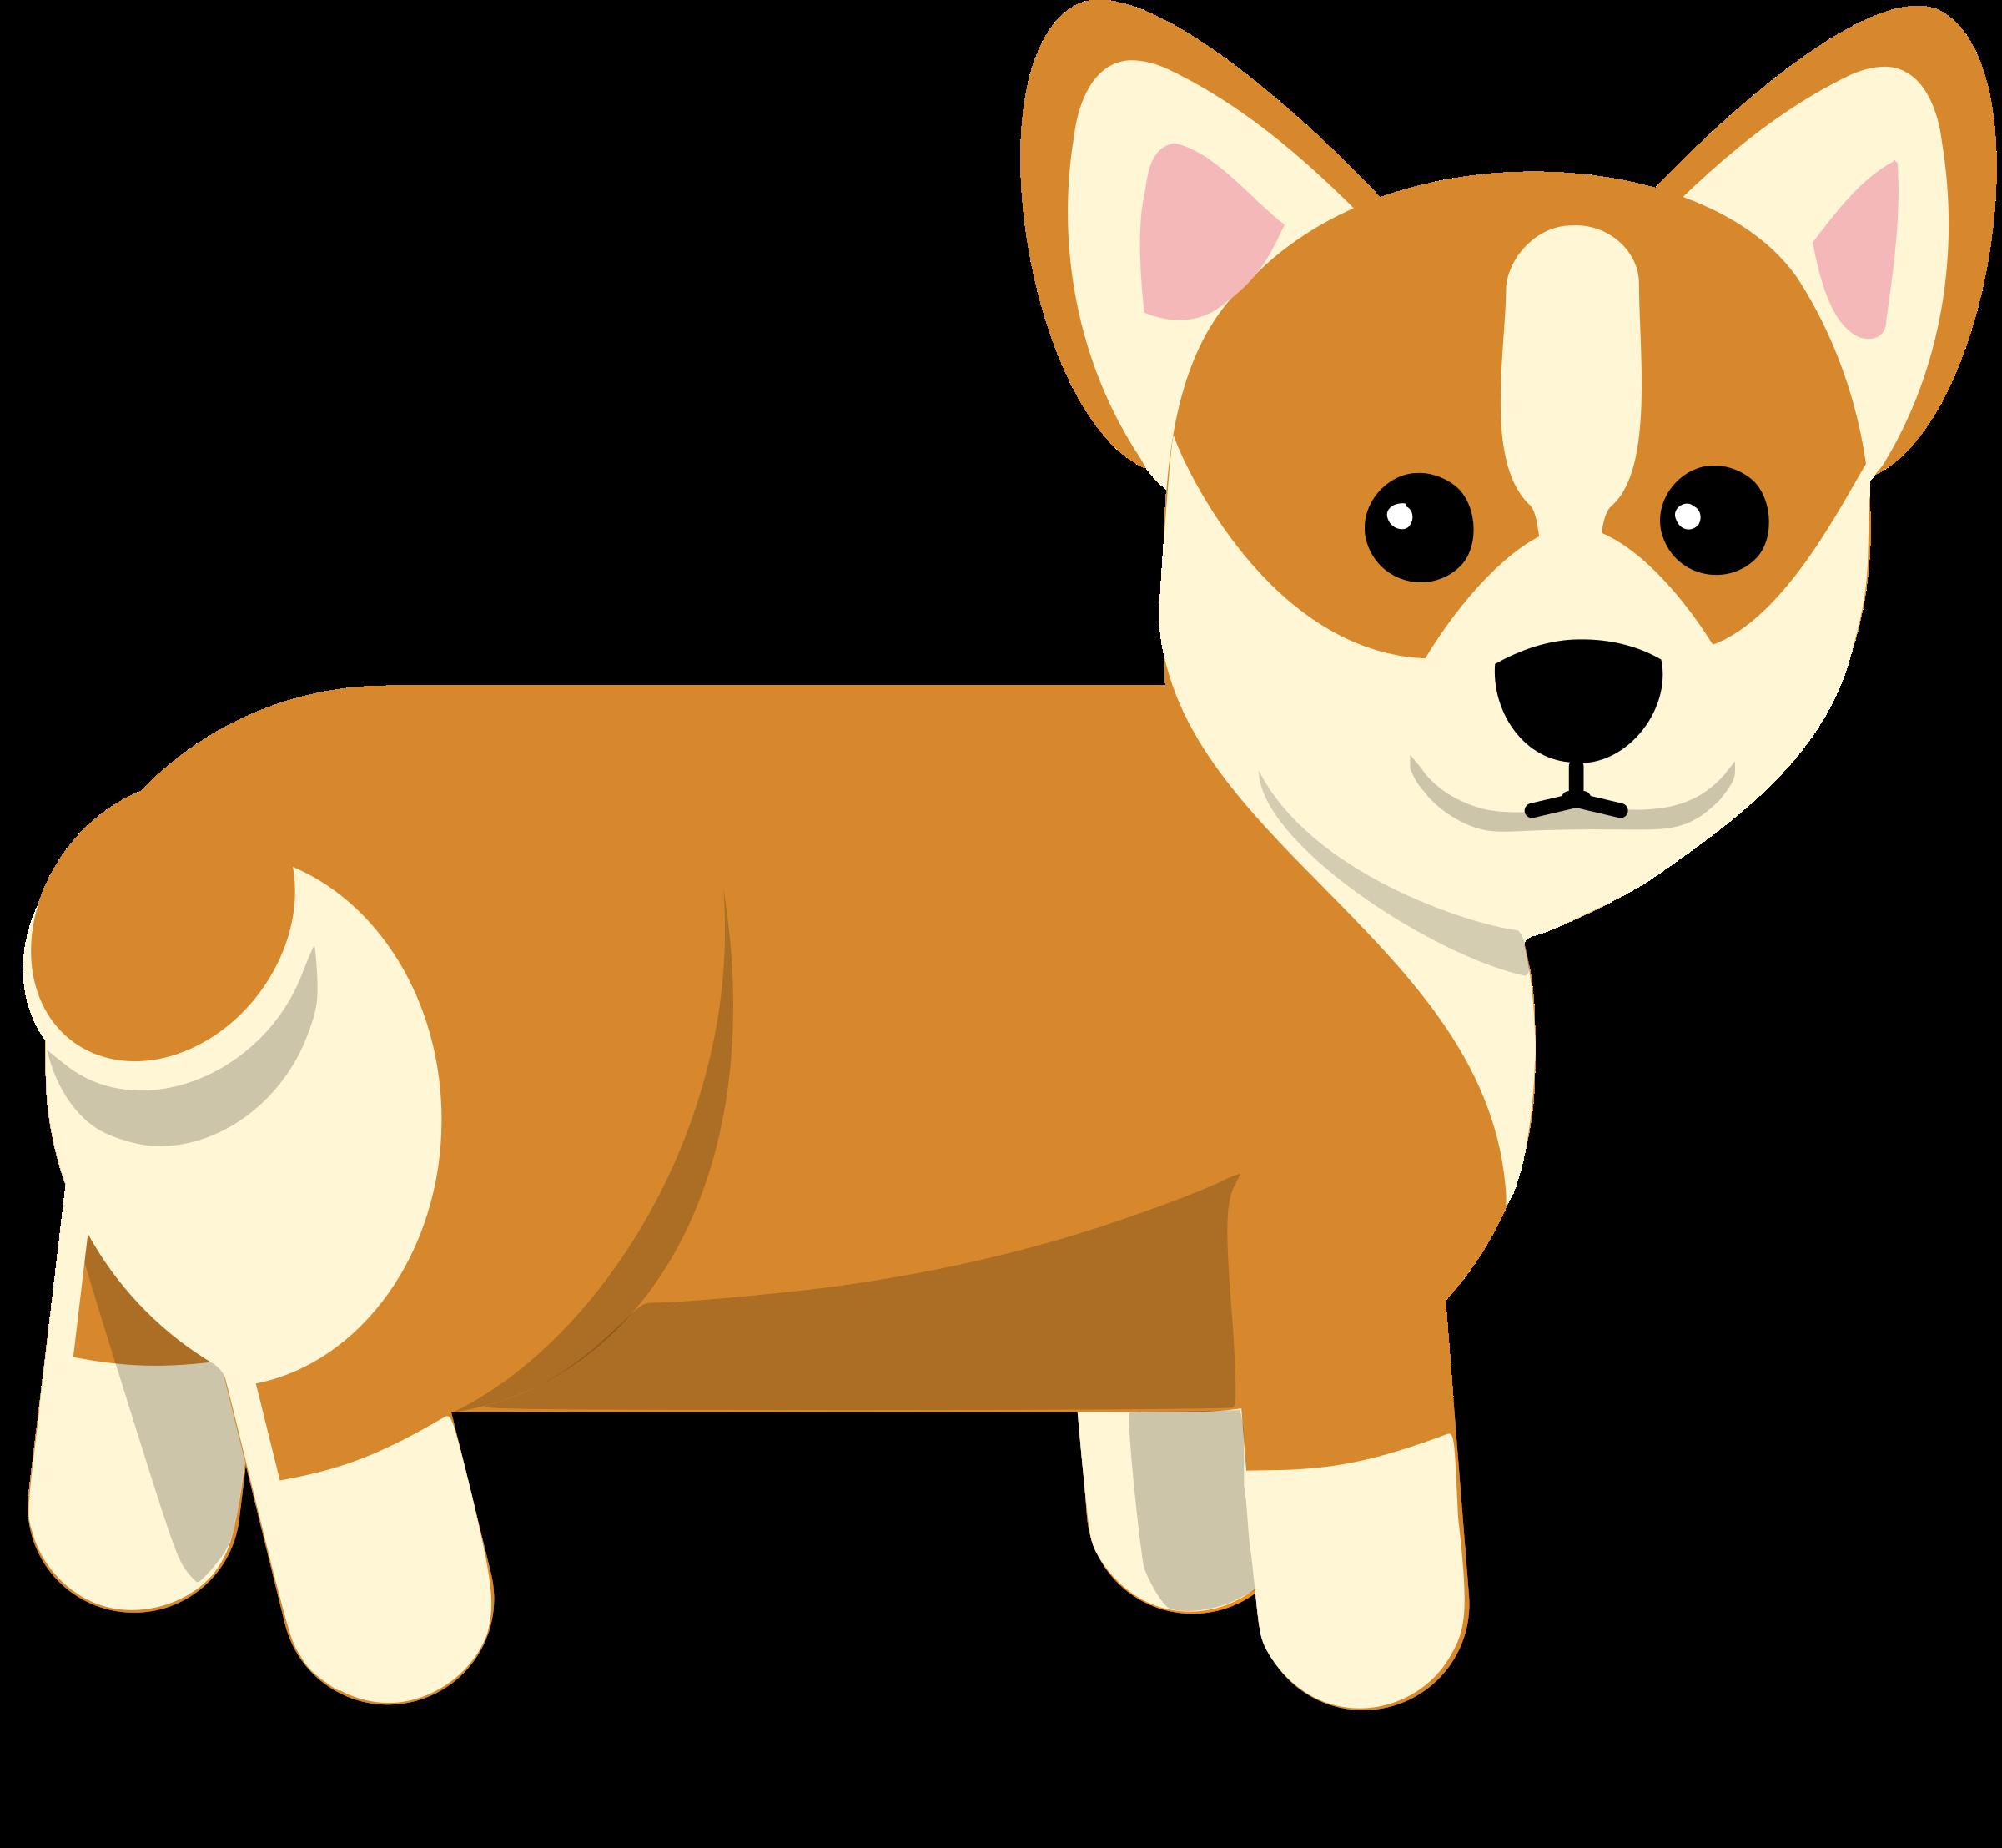 Corgi Dog Vector Clipart image - Free stock photo - Public ... (2400 x 2215 Pixel)